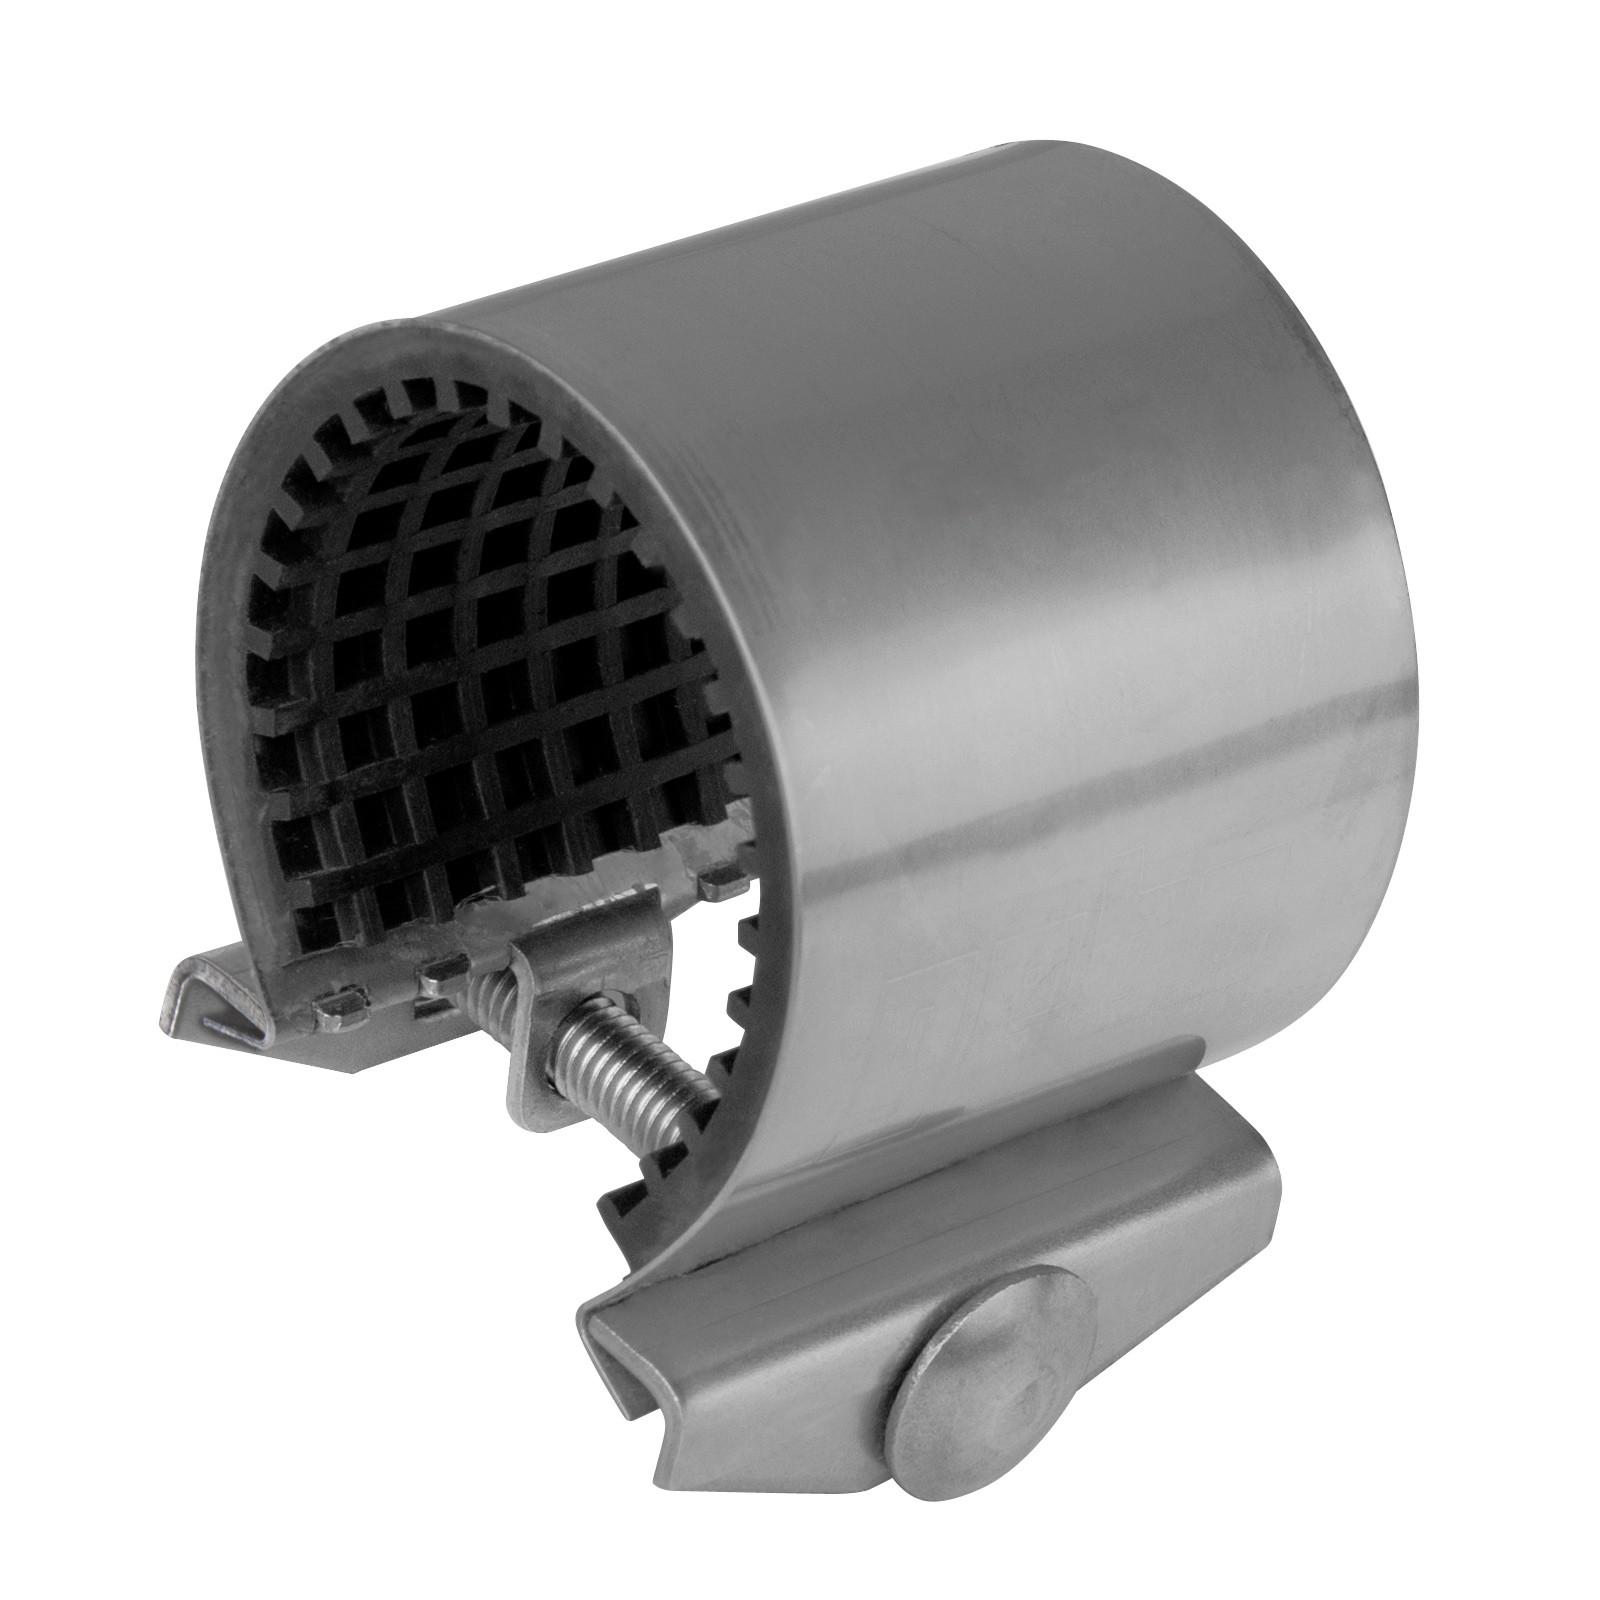 Edelstahl Rohr Dichtband / Dichtschelle 26-30 mm 3/4 Zoll Unifix